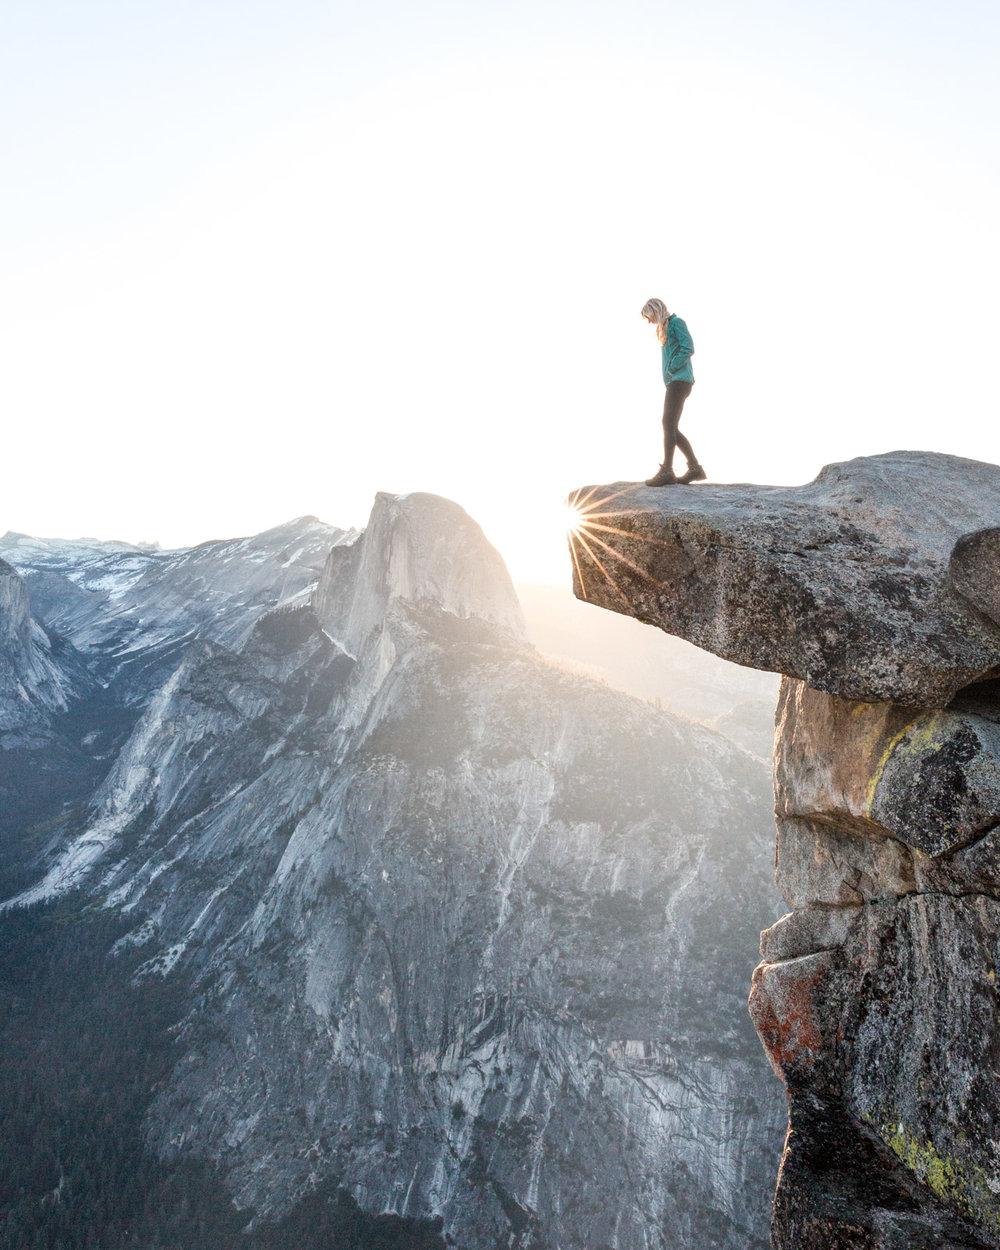 Christian-Schaffer-Yosemite.jpg